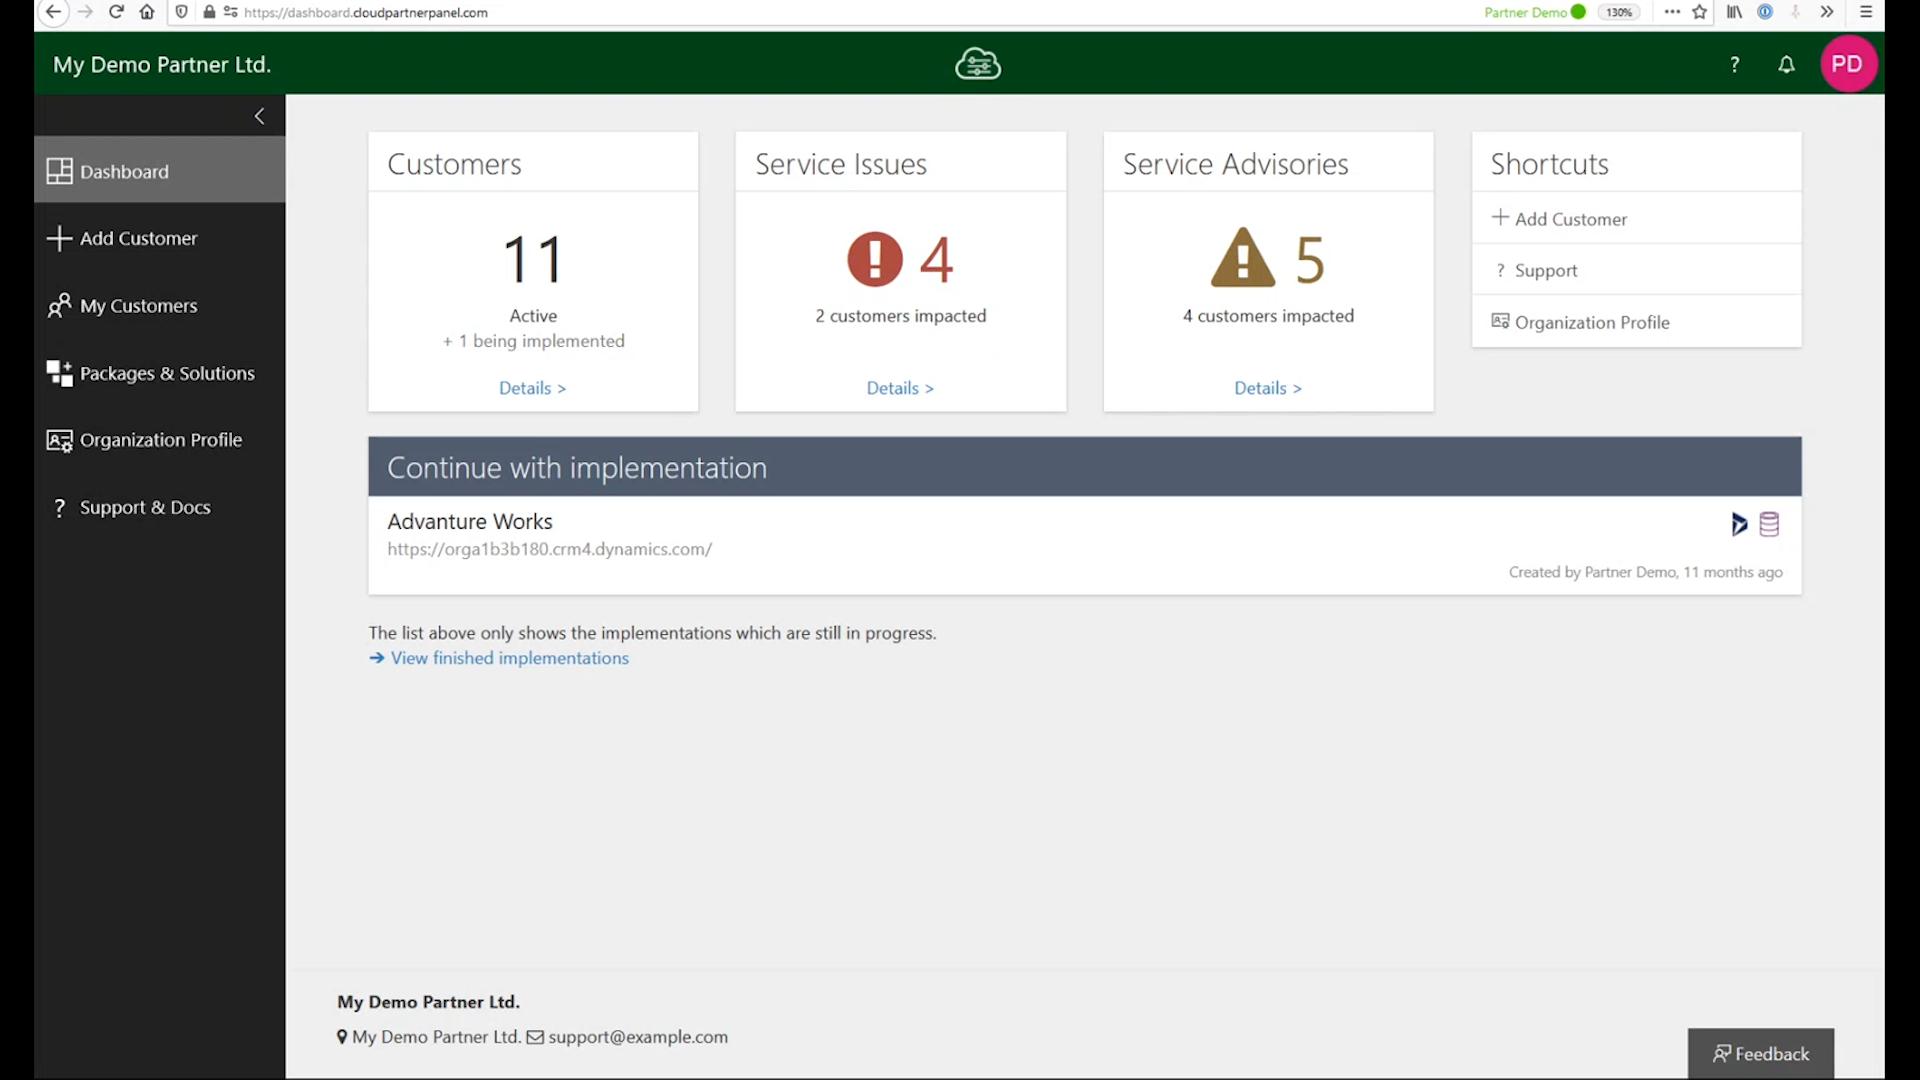 Cloud Partner Panel – Partner management software voor Microsoft Dynamics 365 en Power Apps - Monitor